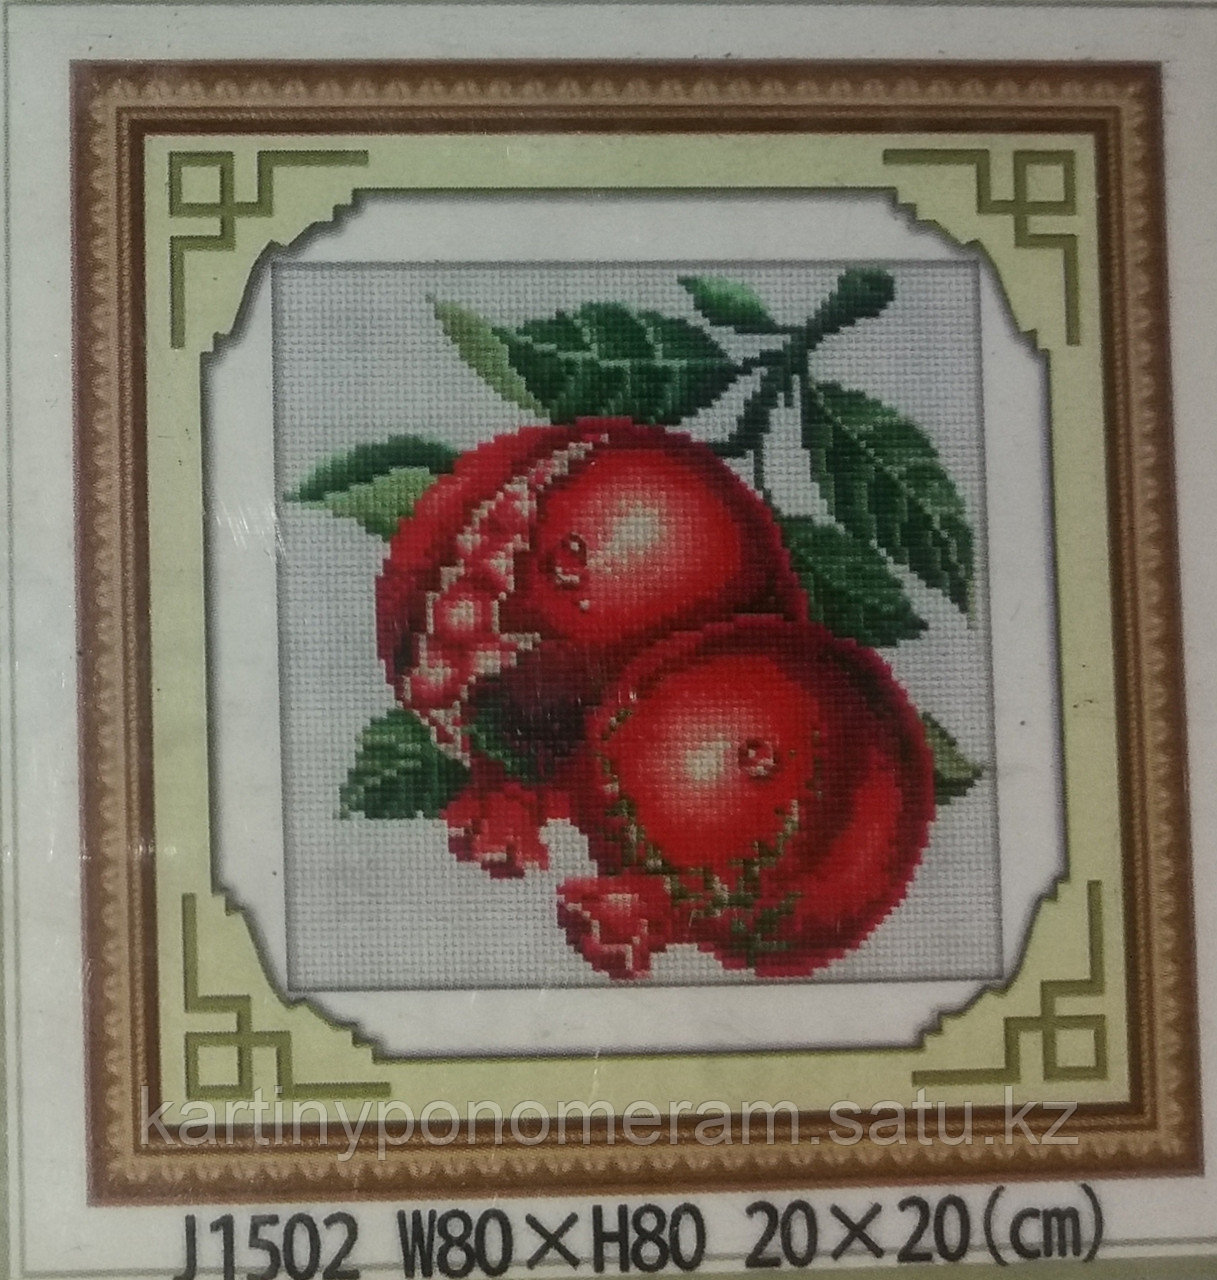 Картина стразами без подрамника J1502 20x20см